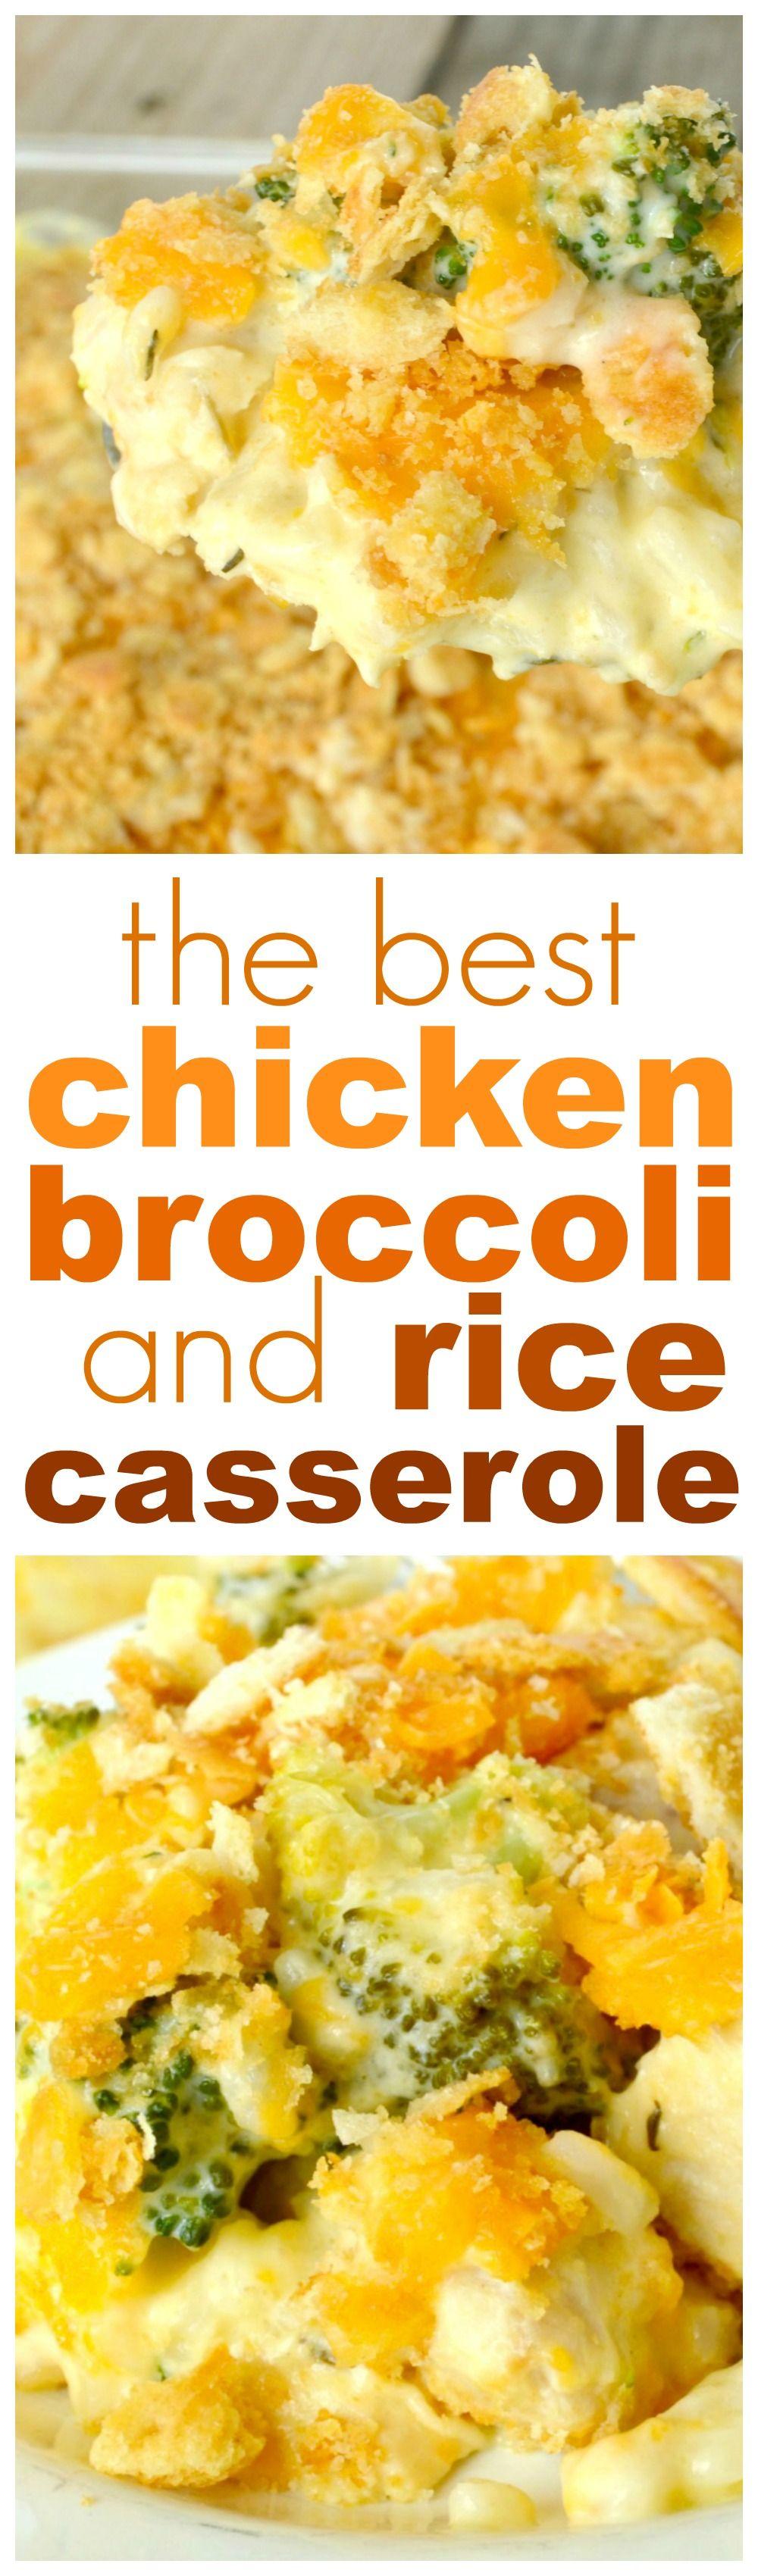 Chicken Broccoli And Rice Casserole  Recipe  Southern -3802